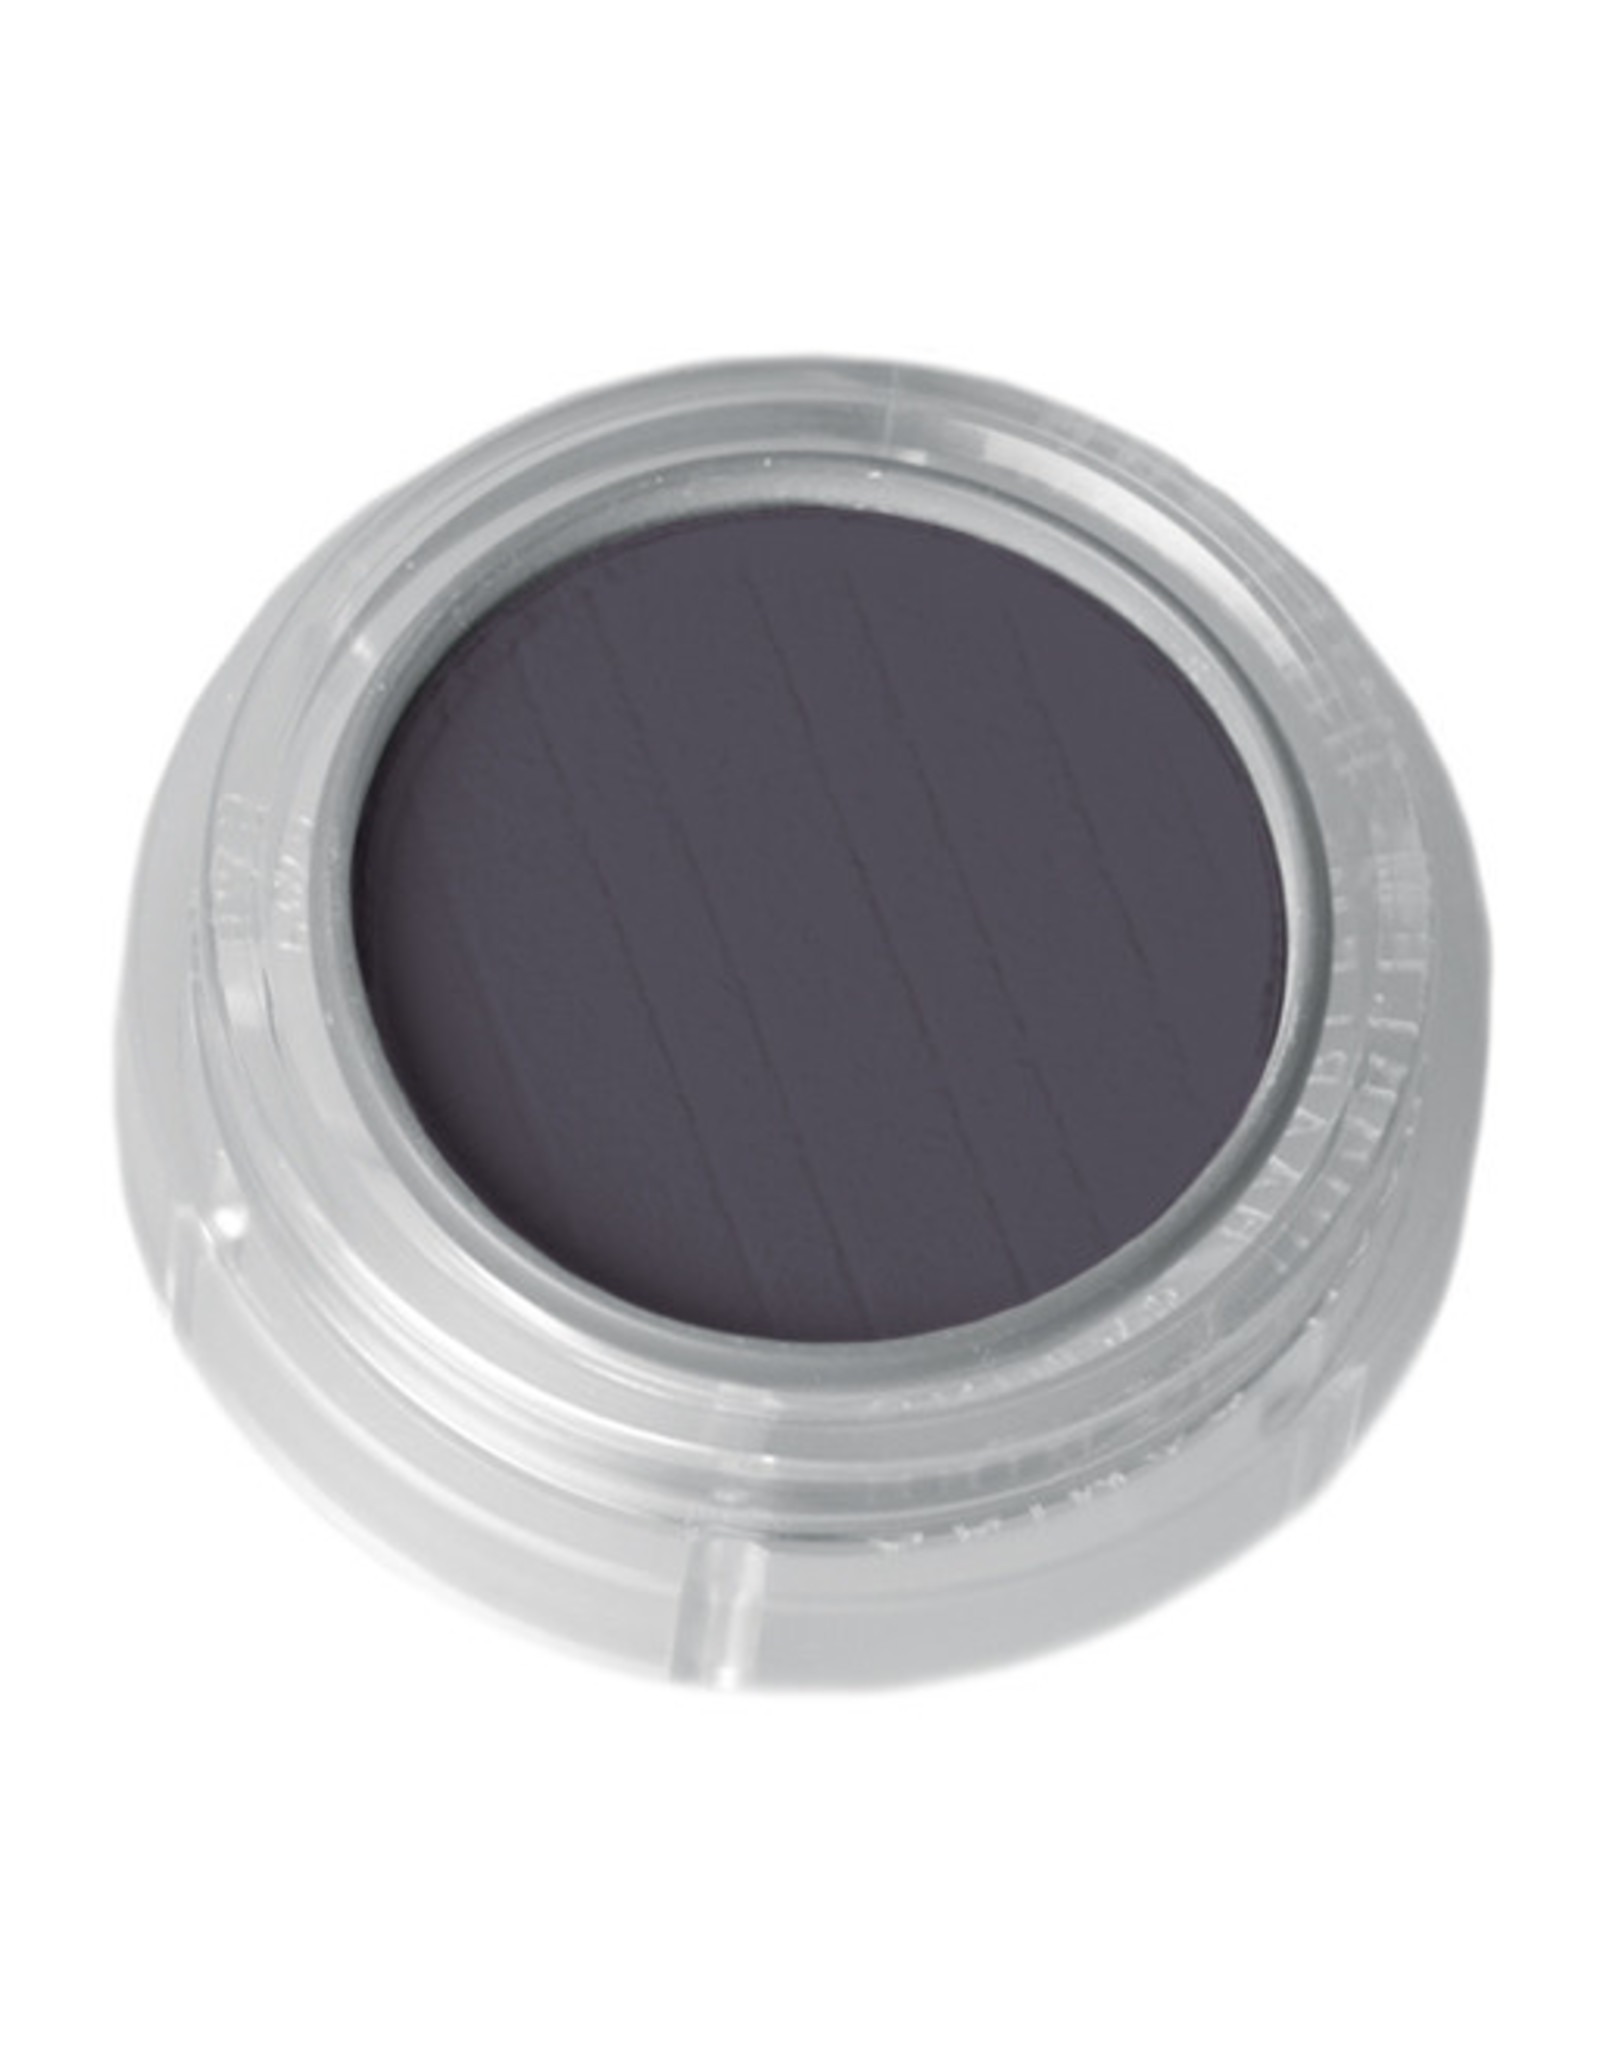 Grimas EYESHADOW/ROUGE 385 Paarsblauw A1 (2 g)